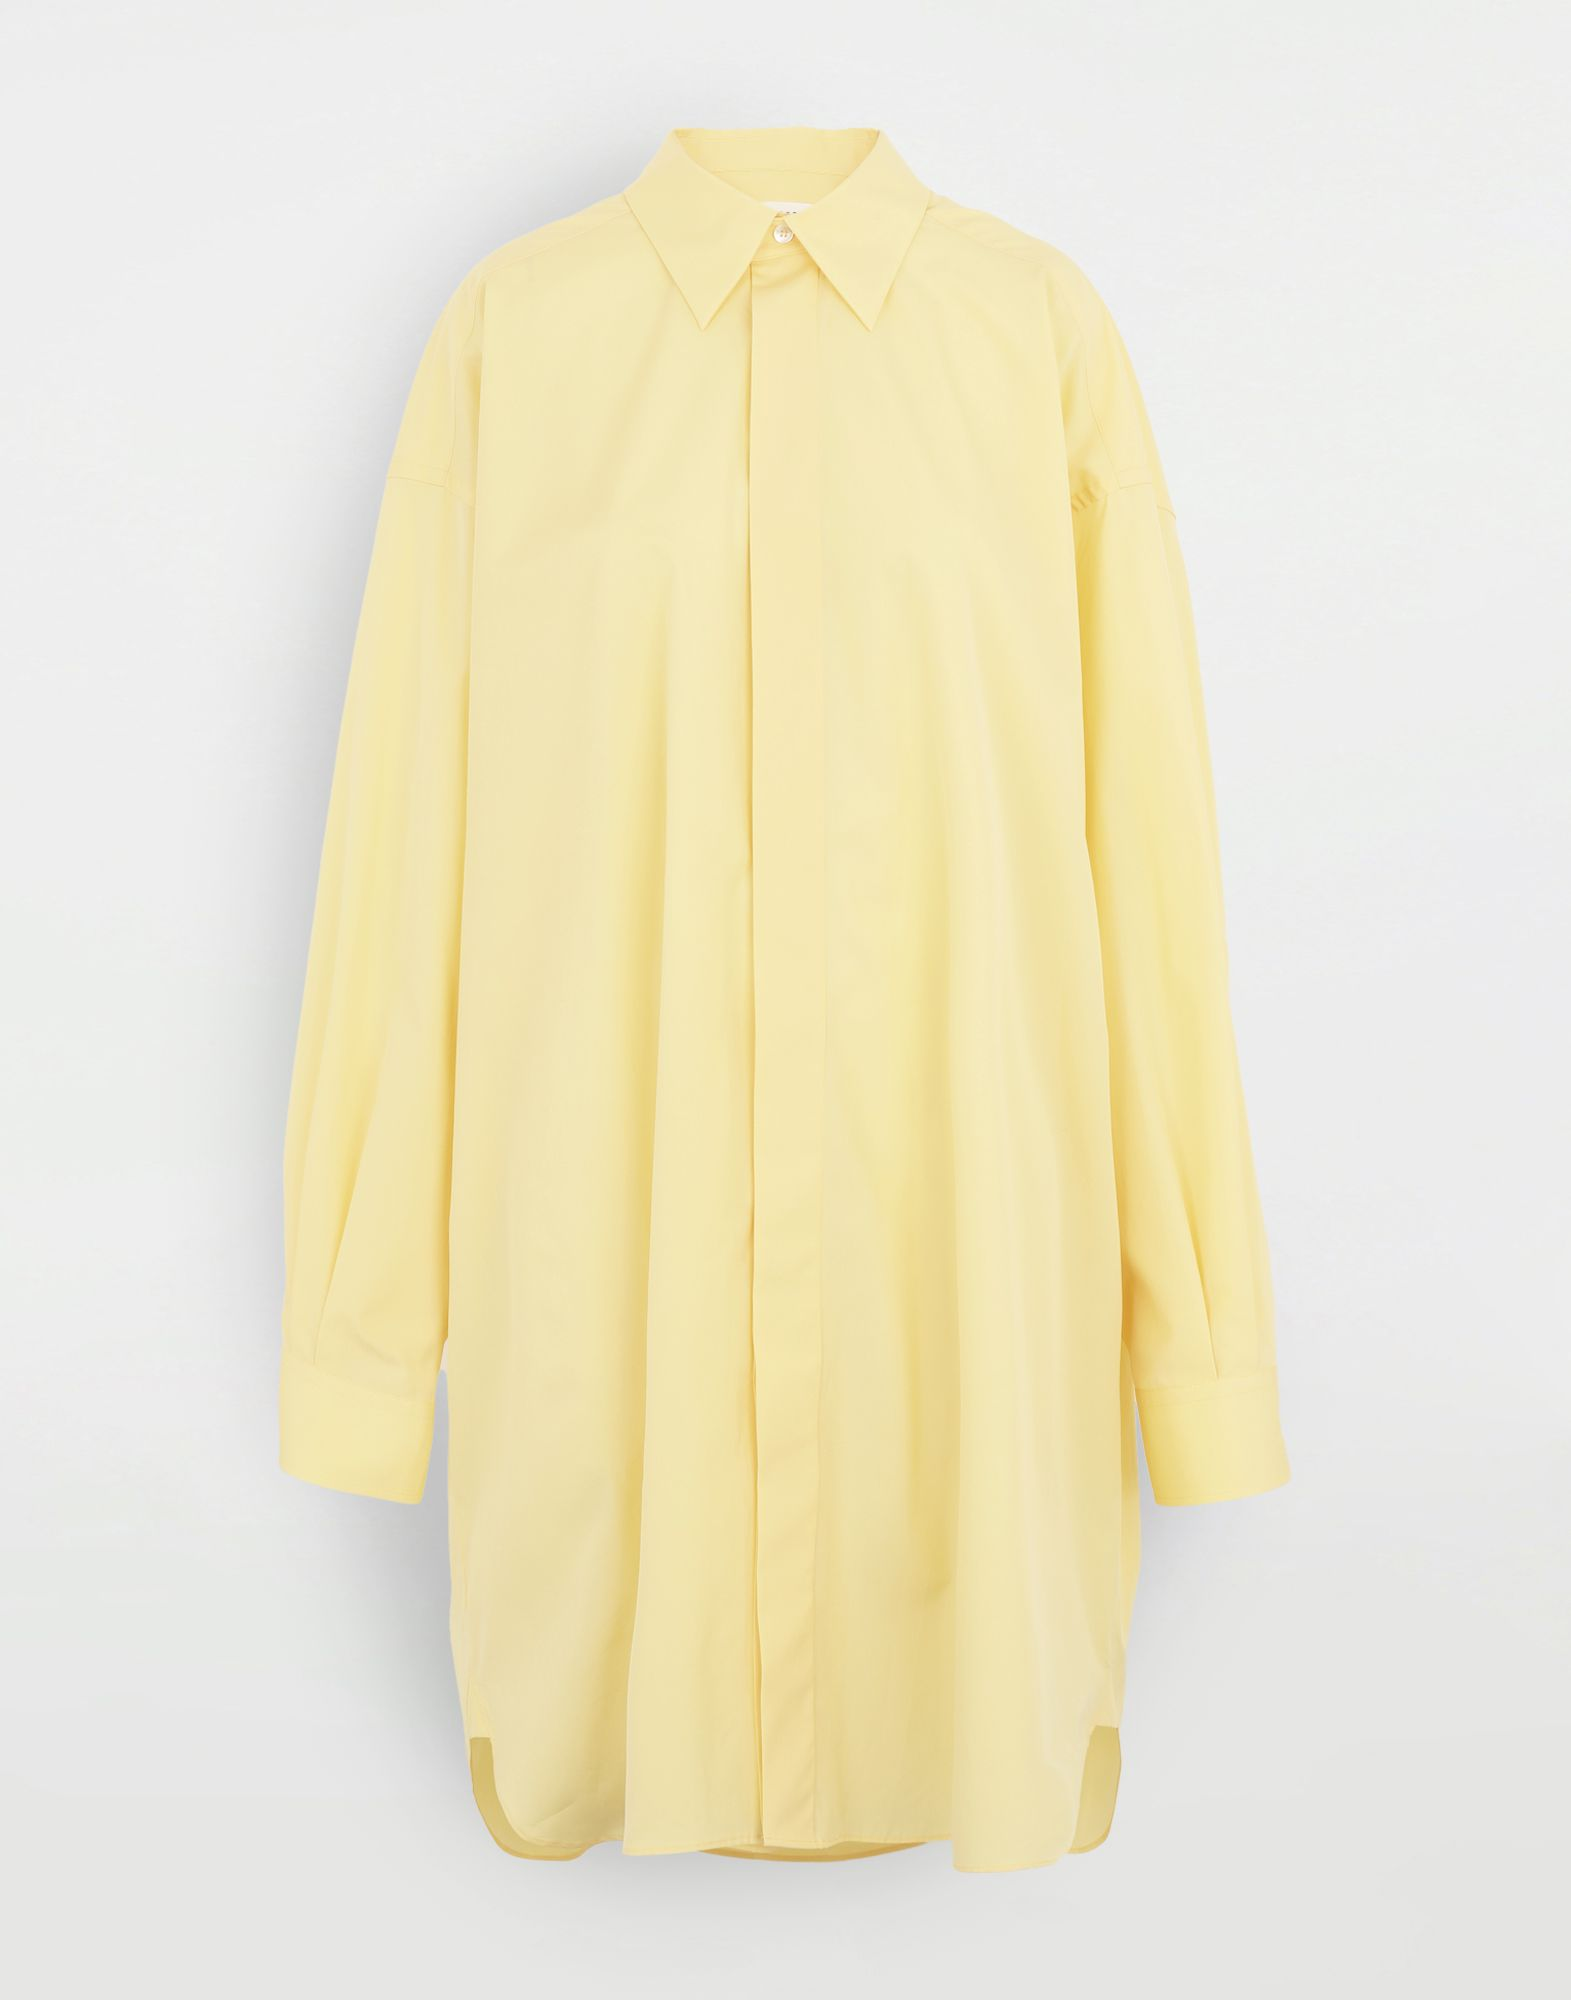 MAISON MARGIELA Oversized shirt Long sleeve shirt Woman f